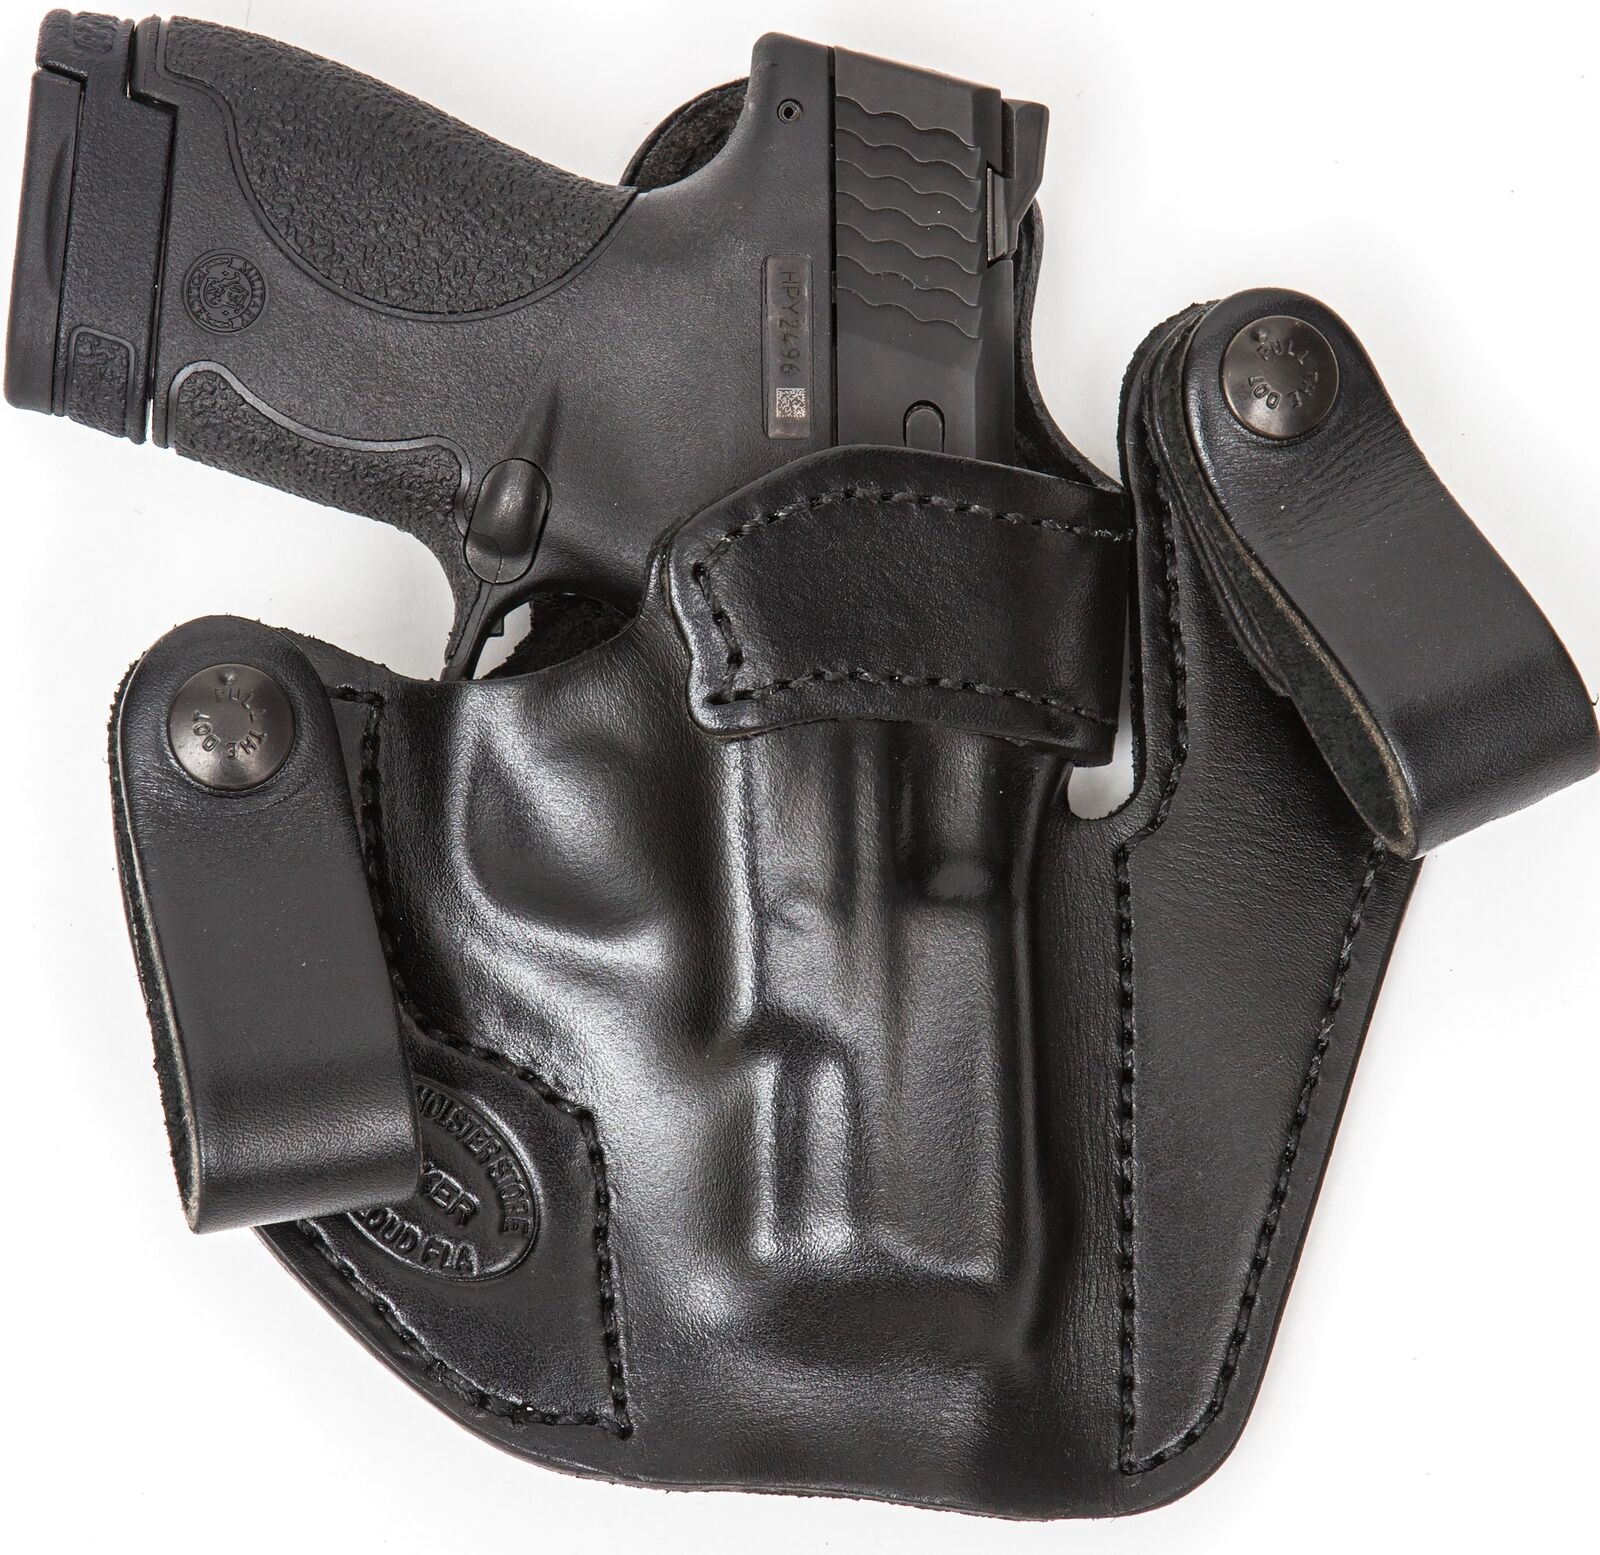 XTREME CARRY RH LH IWB Leder Gun Holster For BERSA 9 ULTRA COMPACT